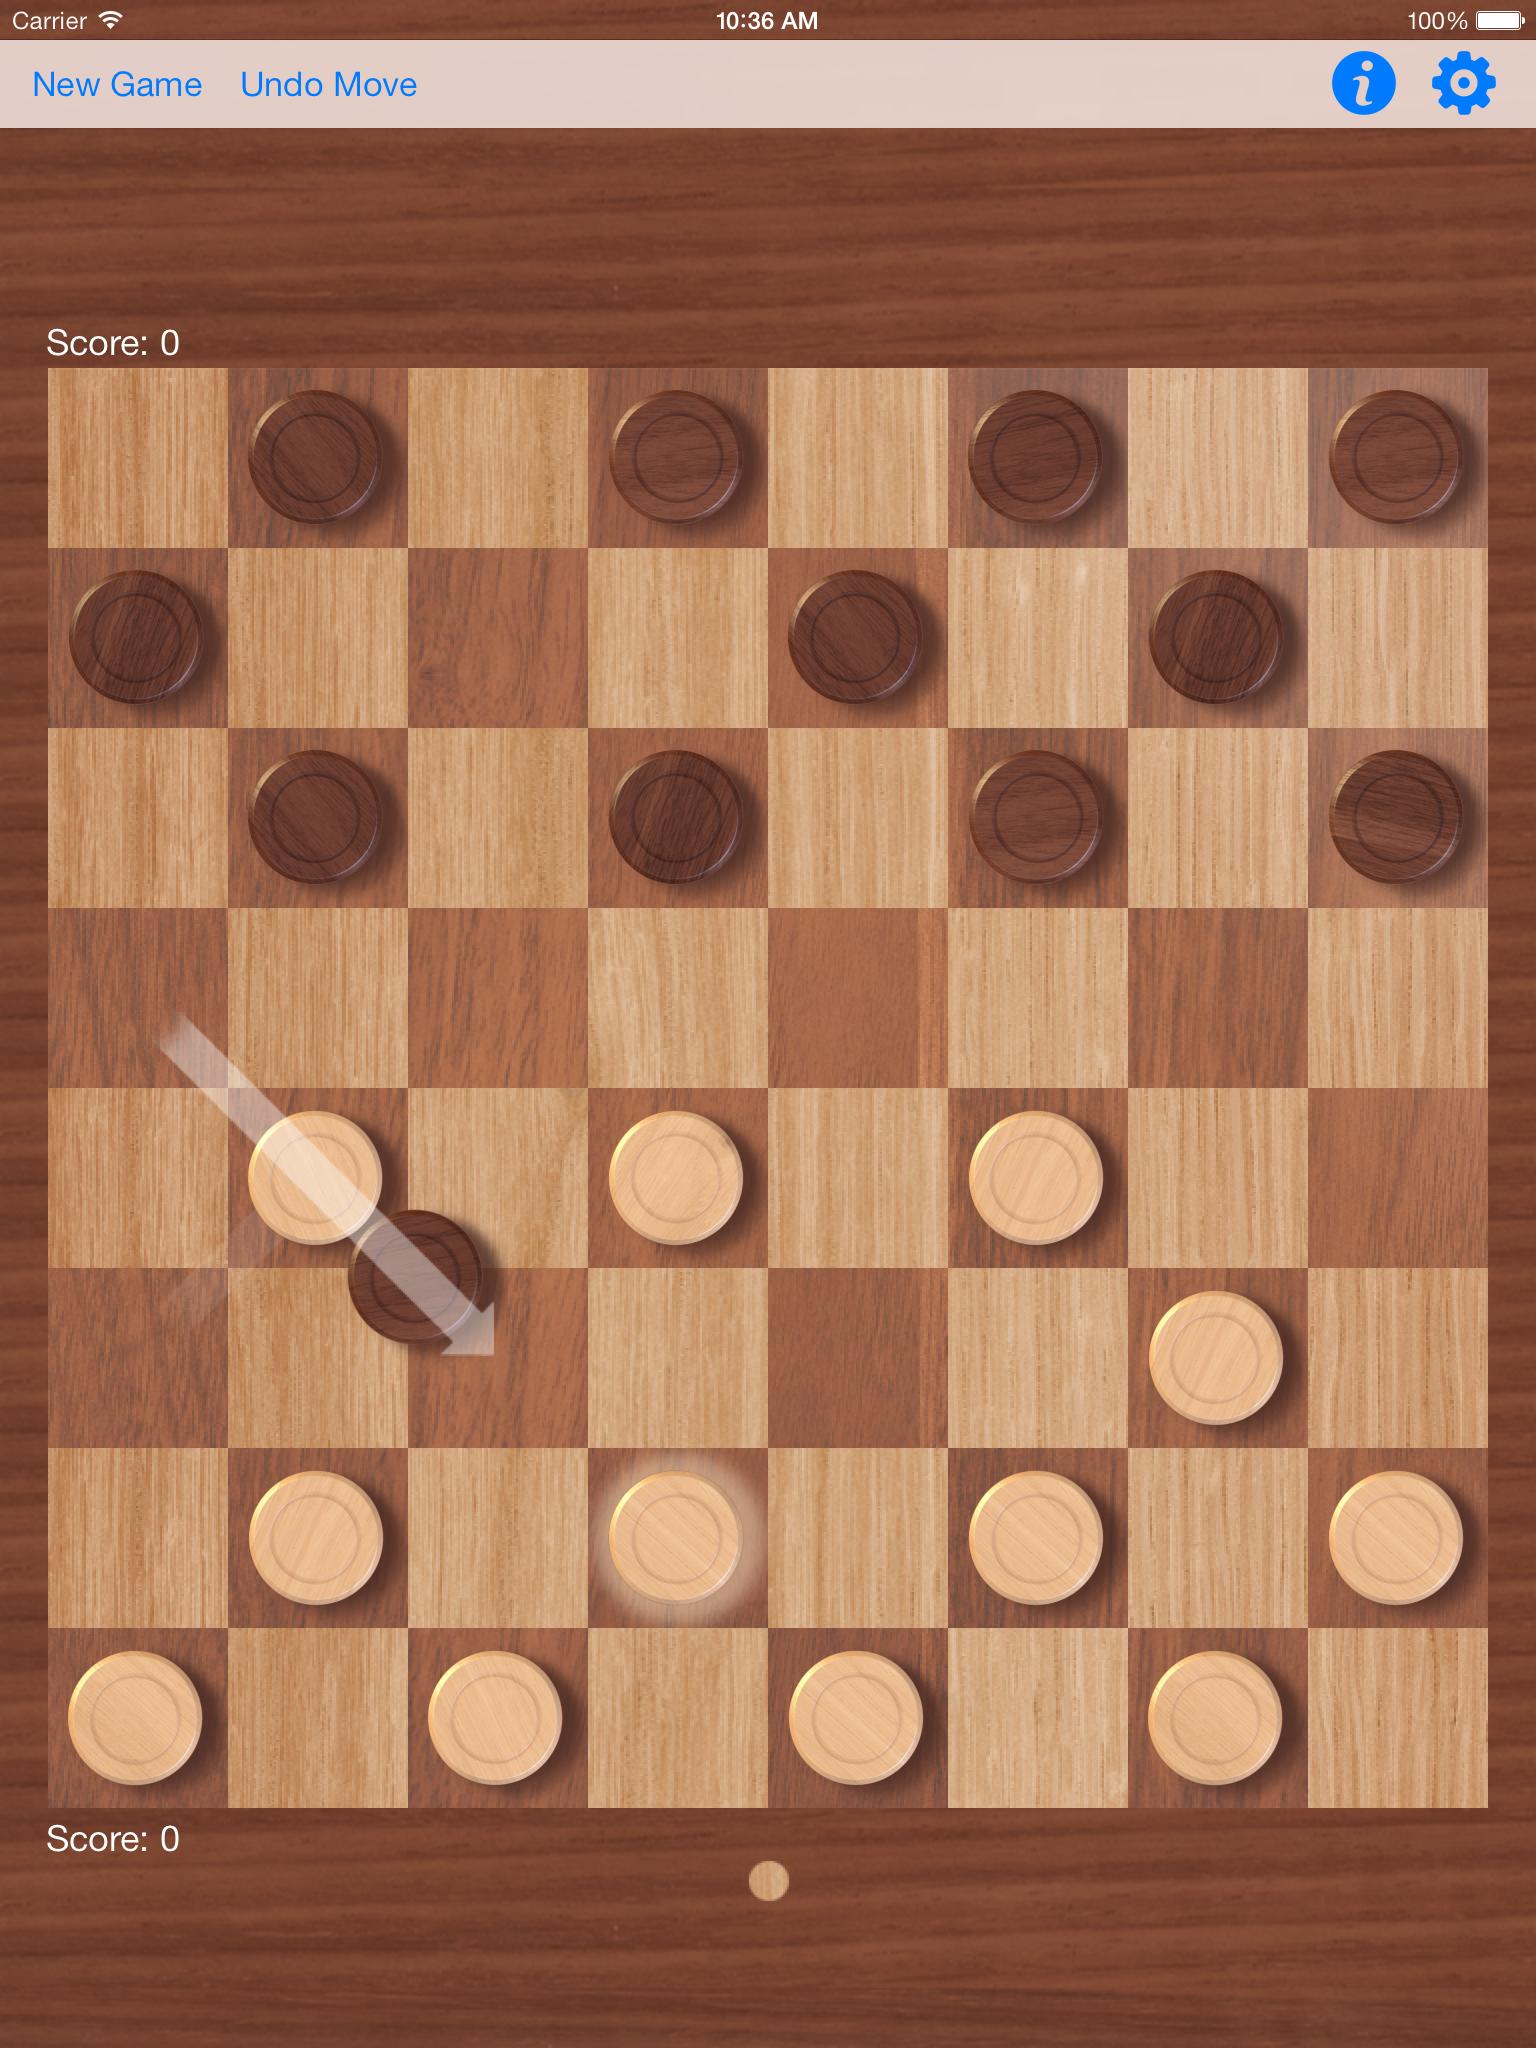 iOS Simulator Screen shot Oct 15, 2013, 10.36.26 AM.png